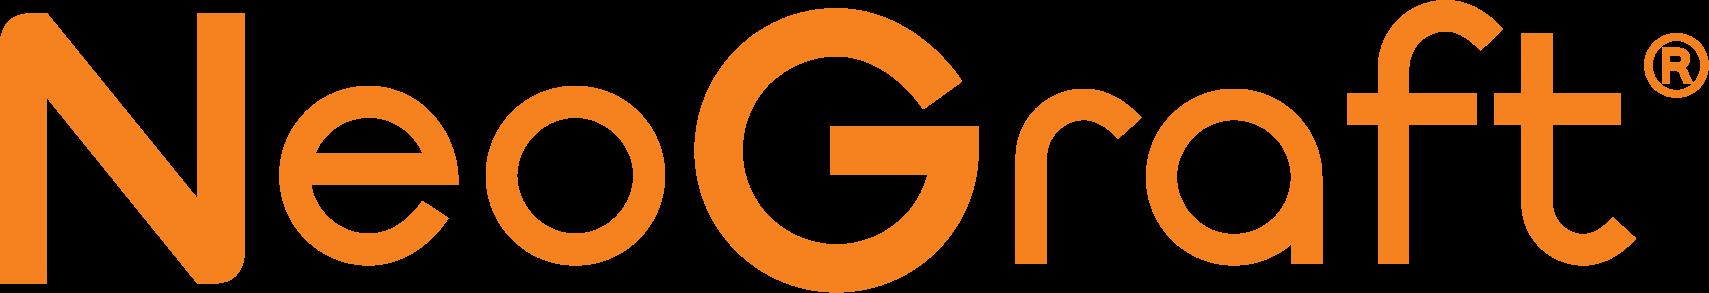 NeoGraft logo image